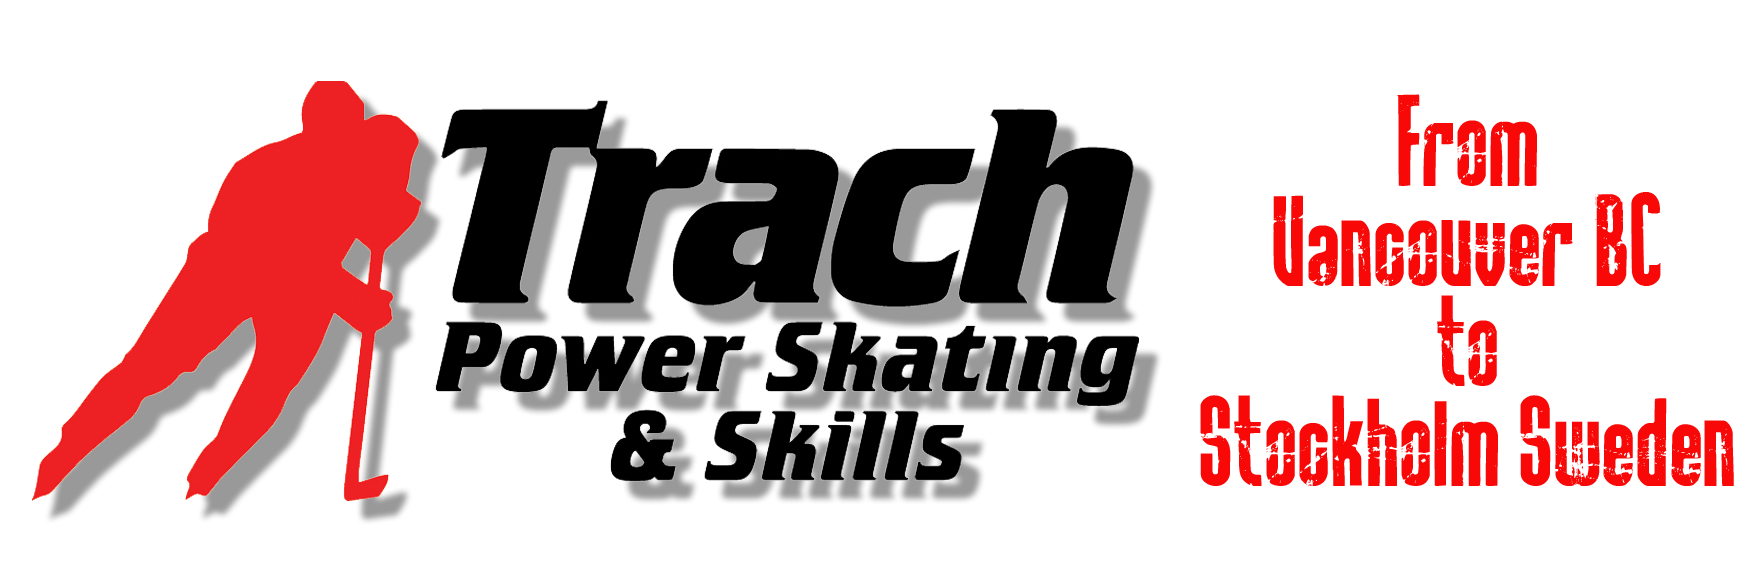 Trach Power Skating